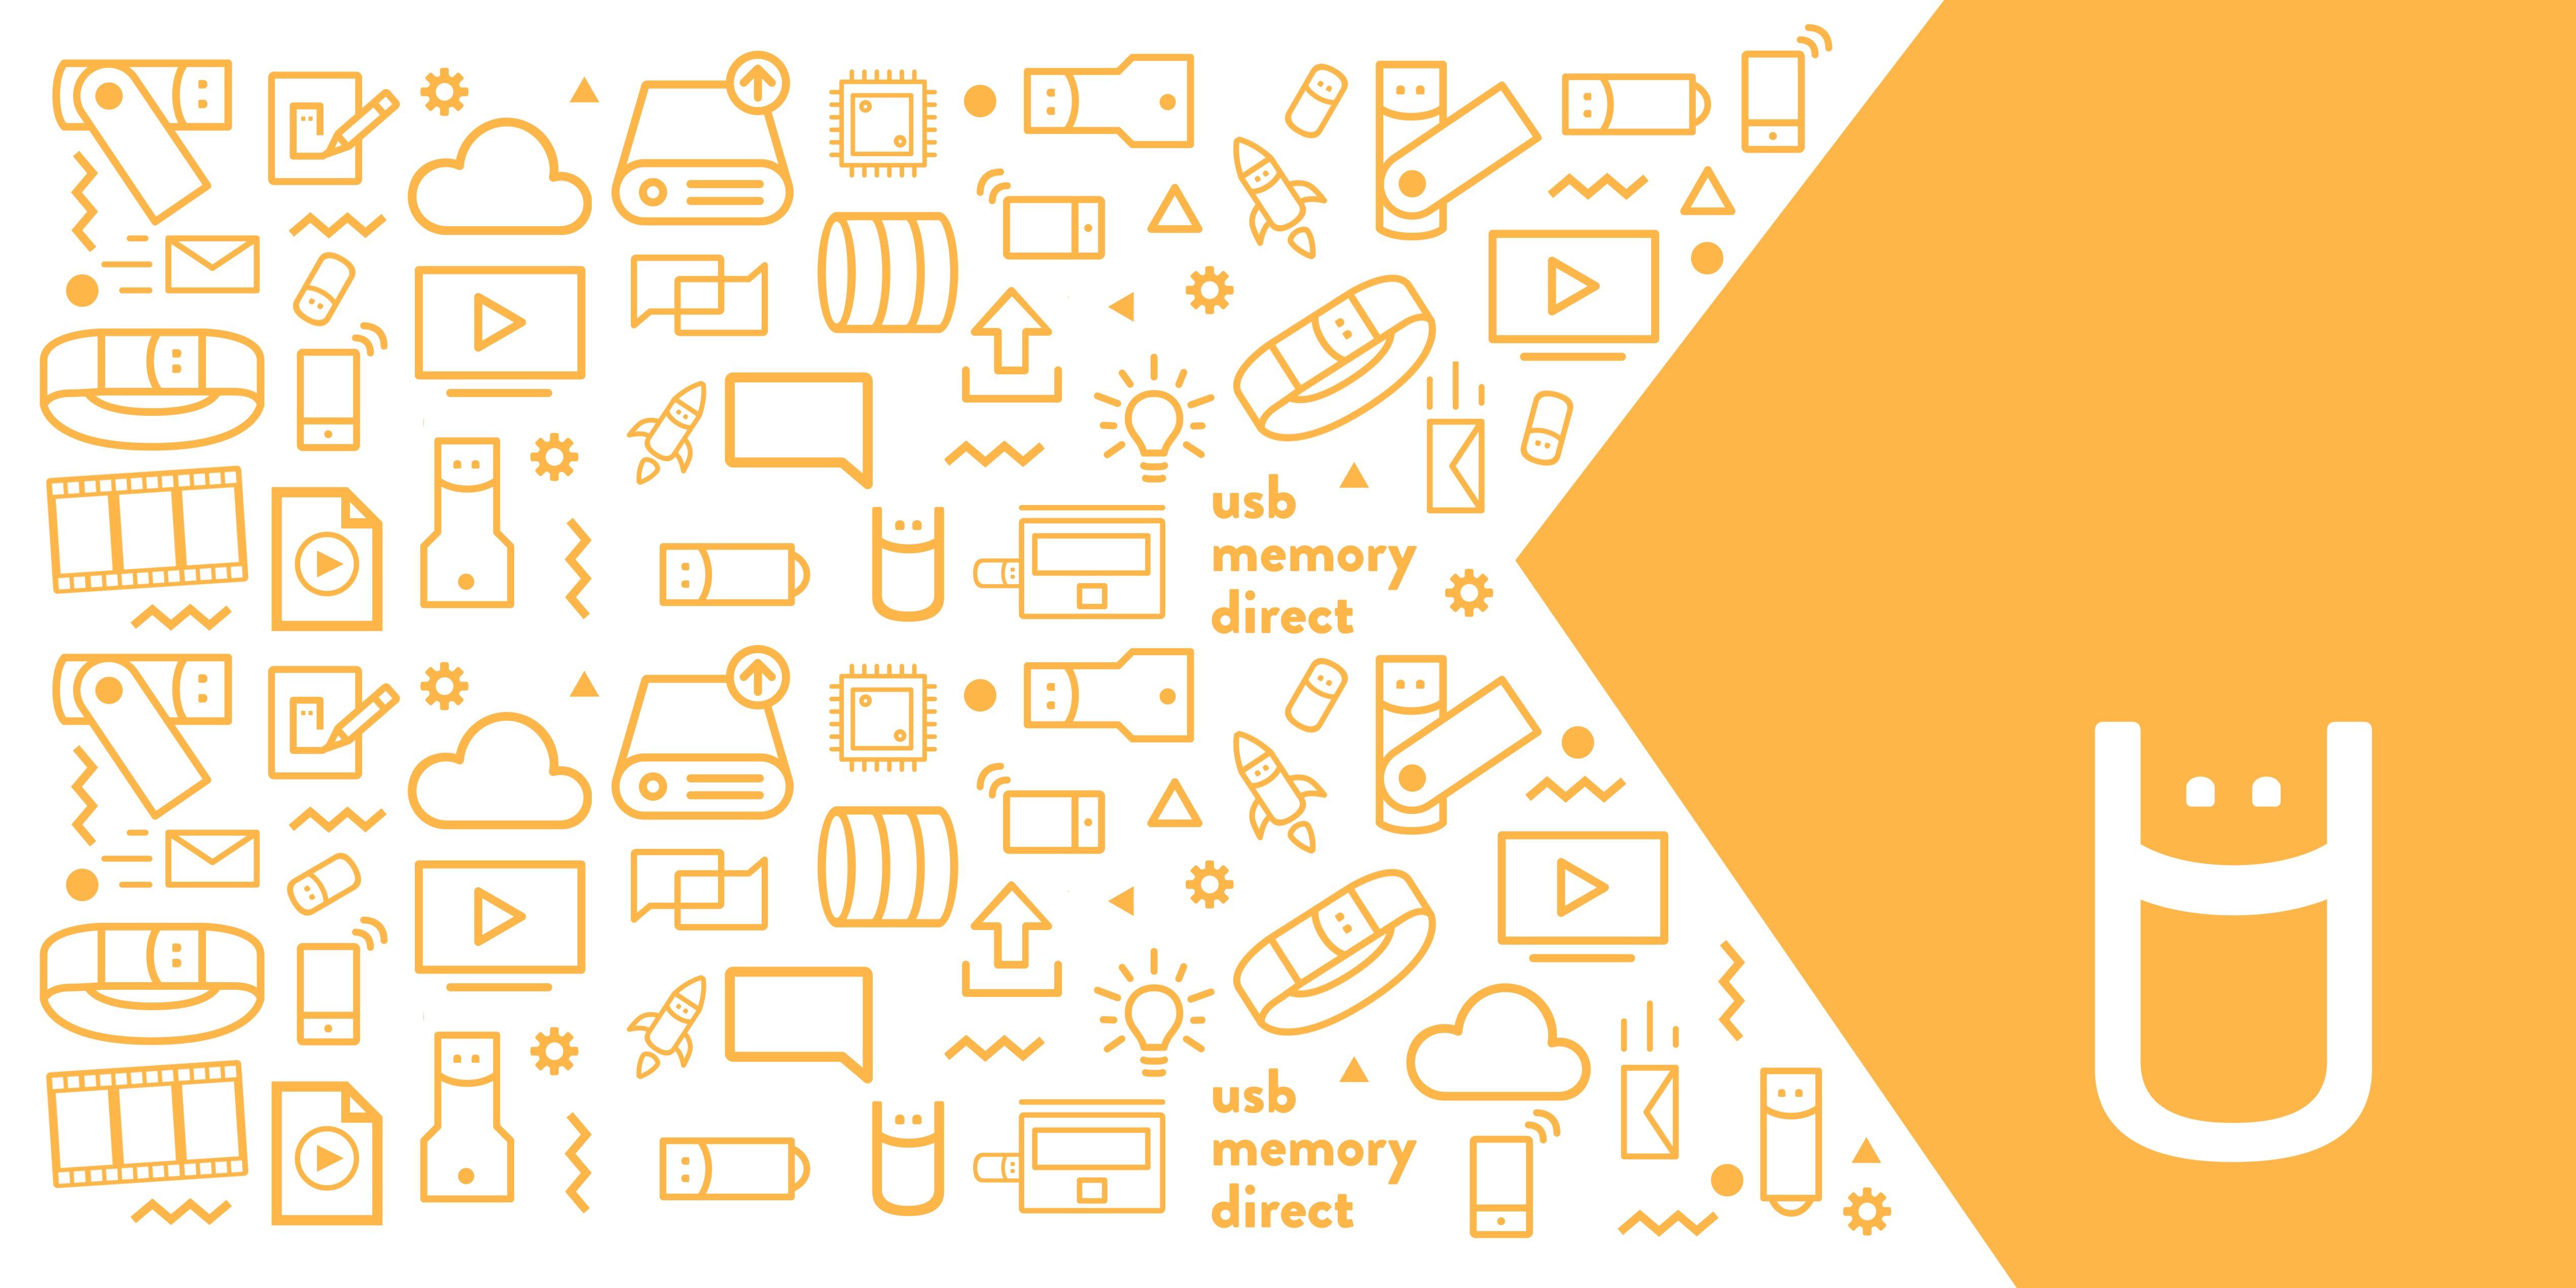 USB Memory Direct | LinkedIn